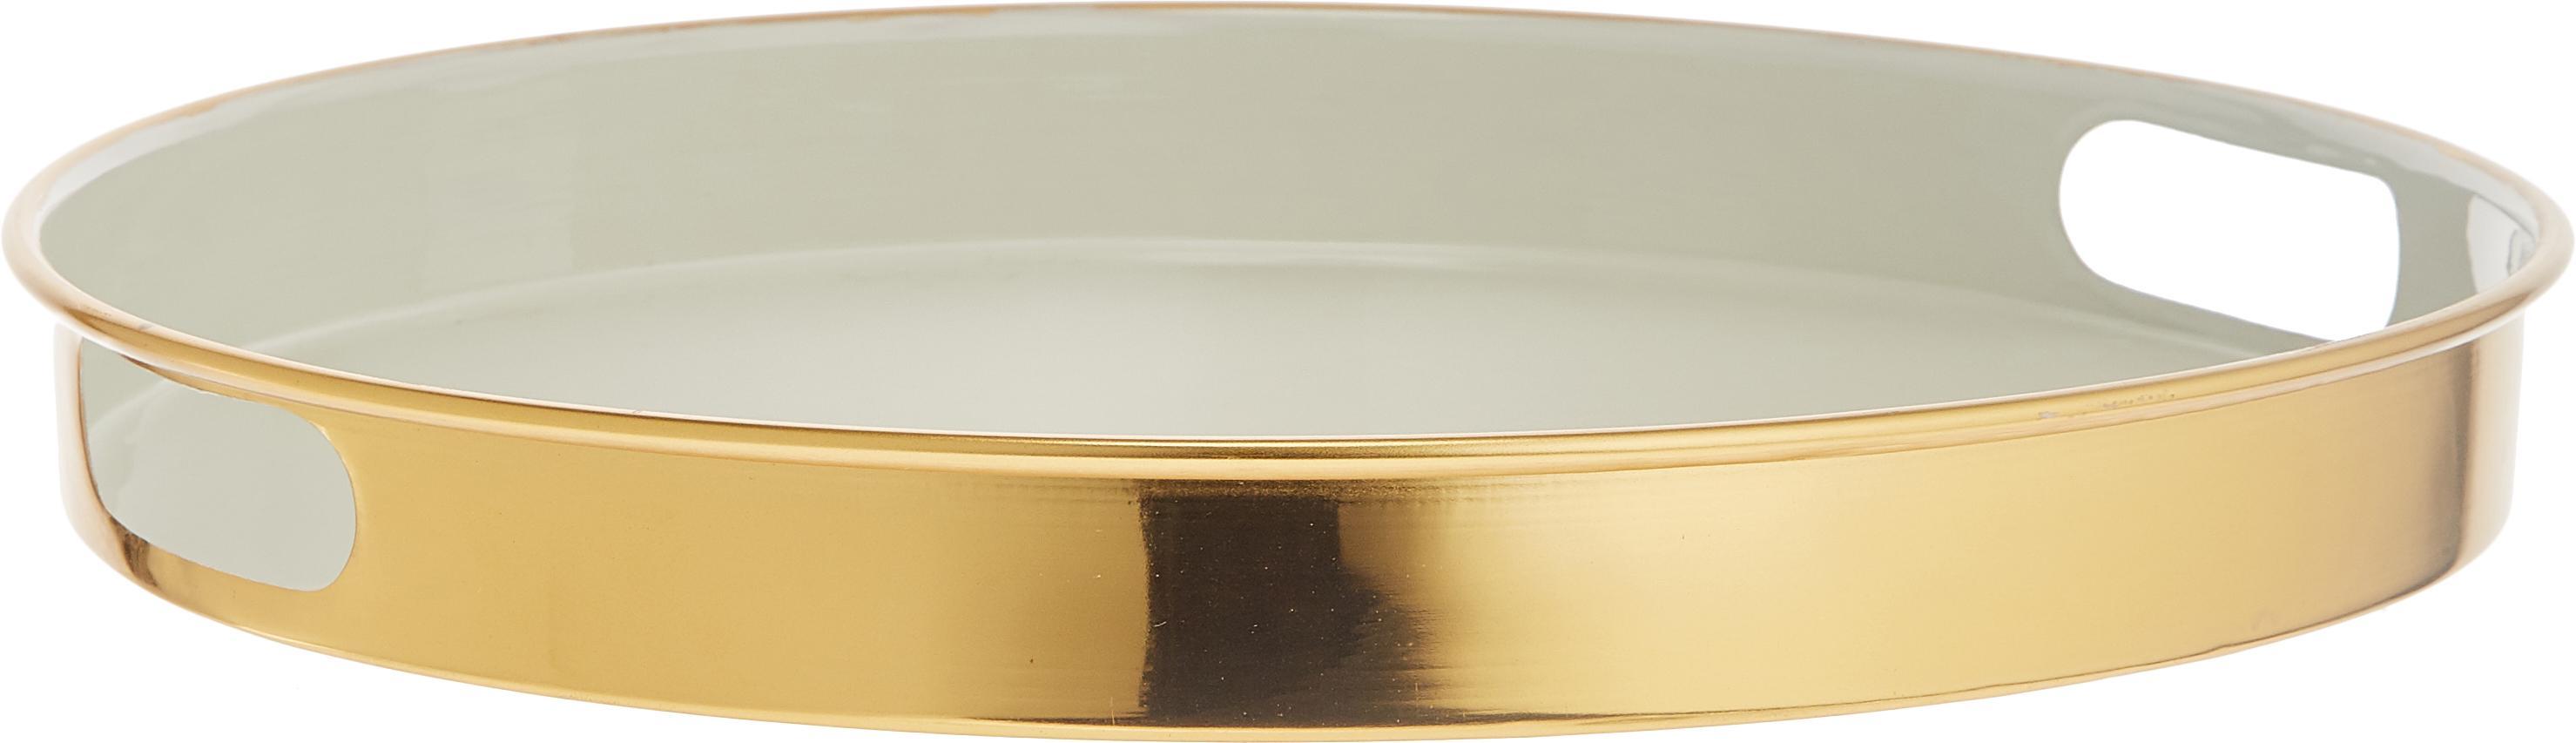 Rundes Serviertablett Dining, Metall, beschichtet, Hellgrau, Goldfarben, Ø 38 x H 5 cm